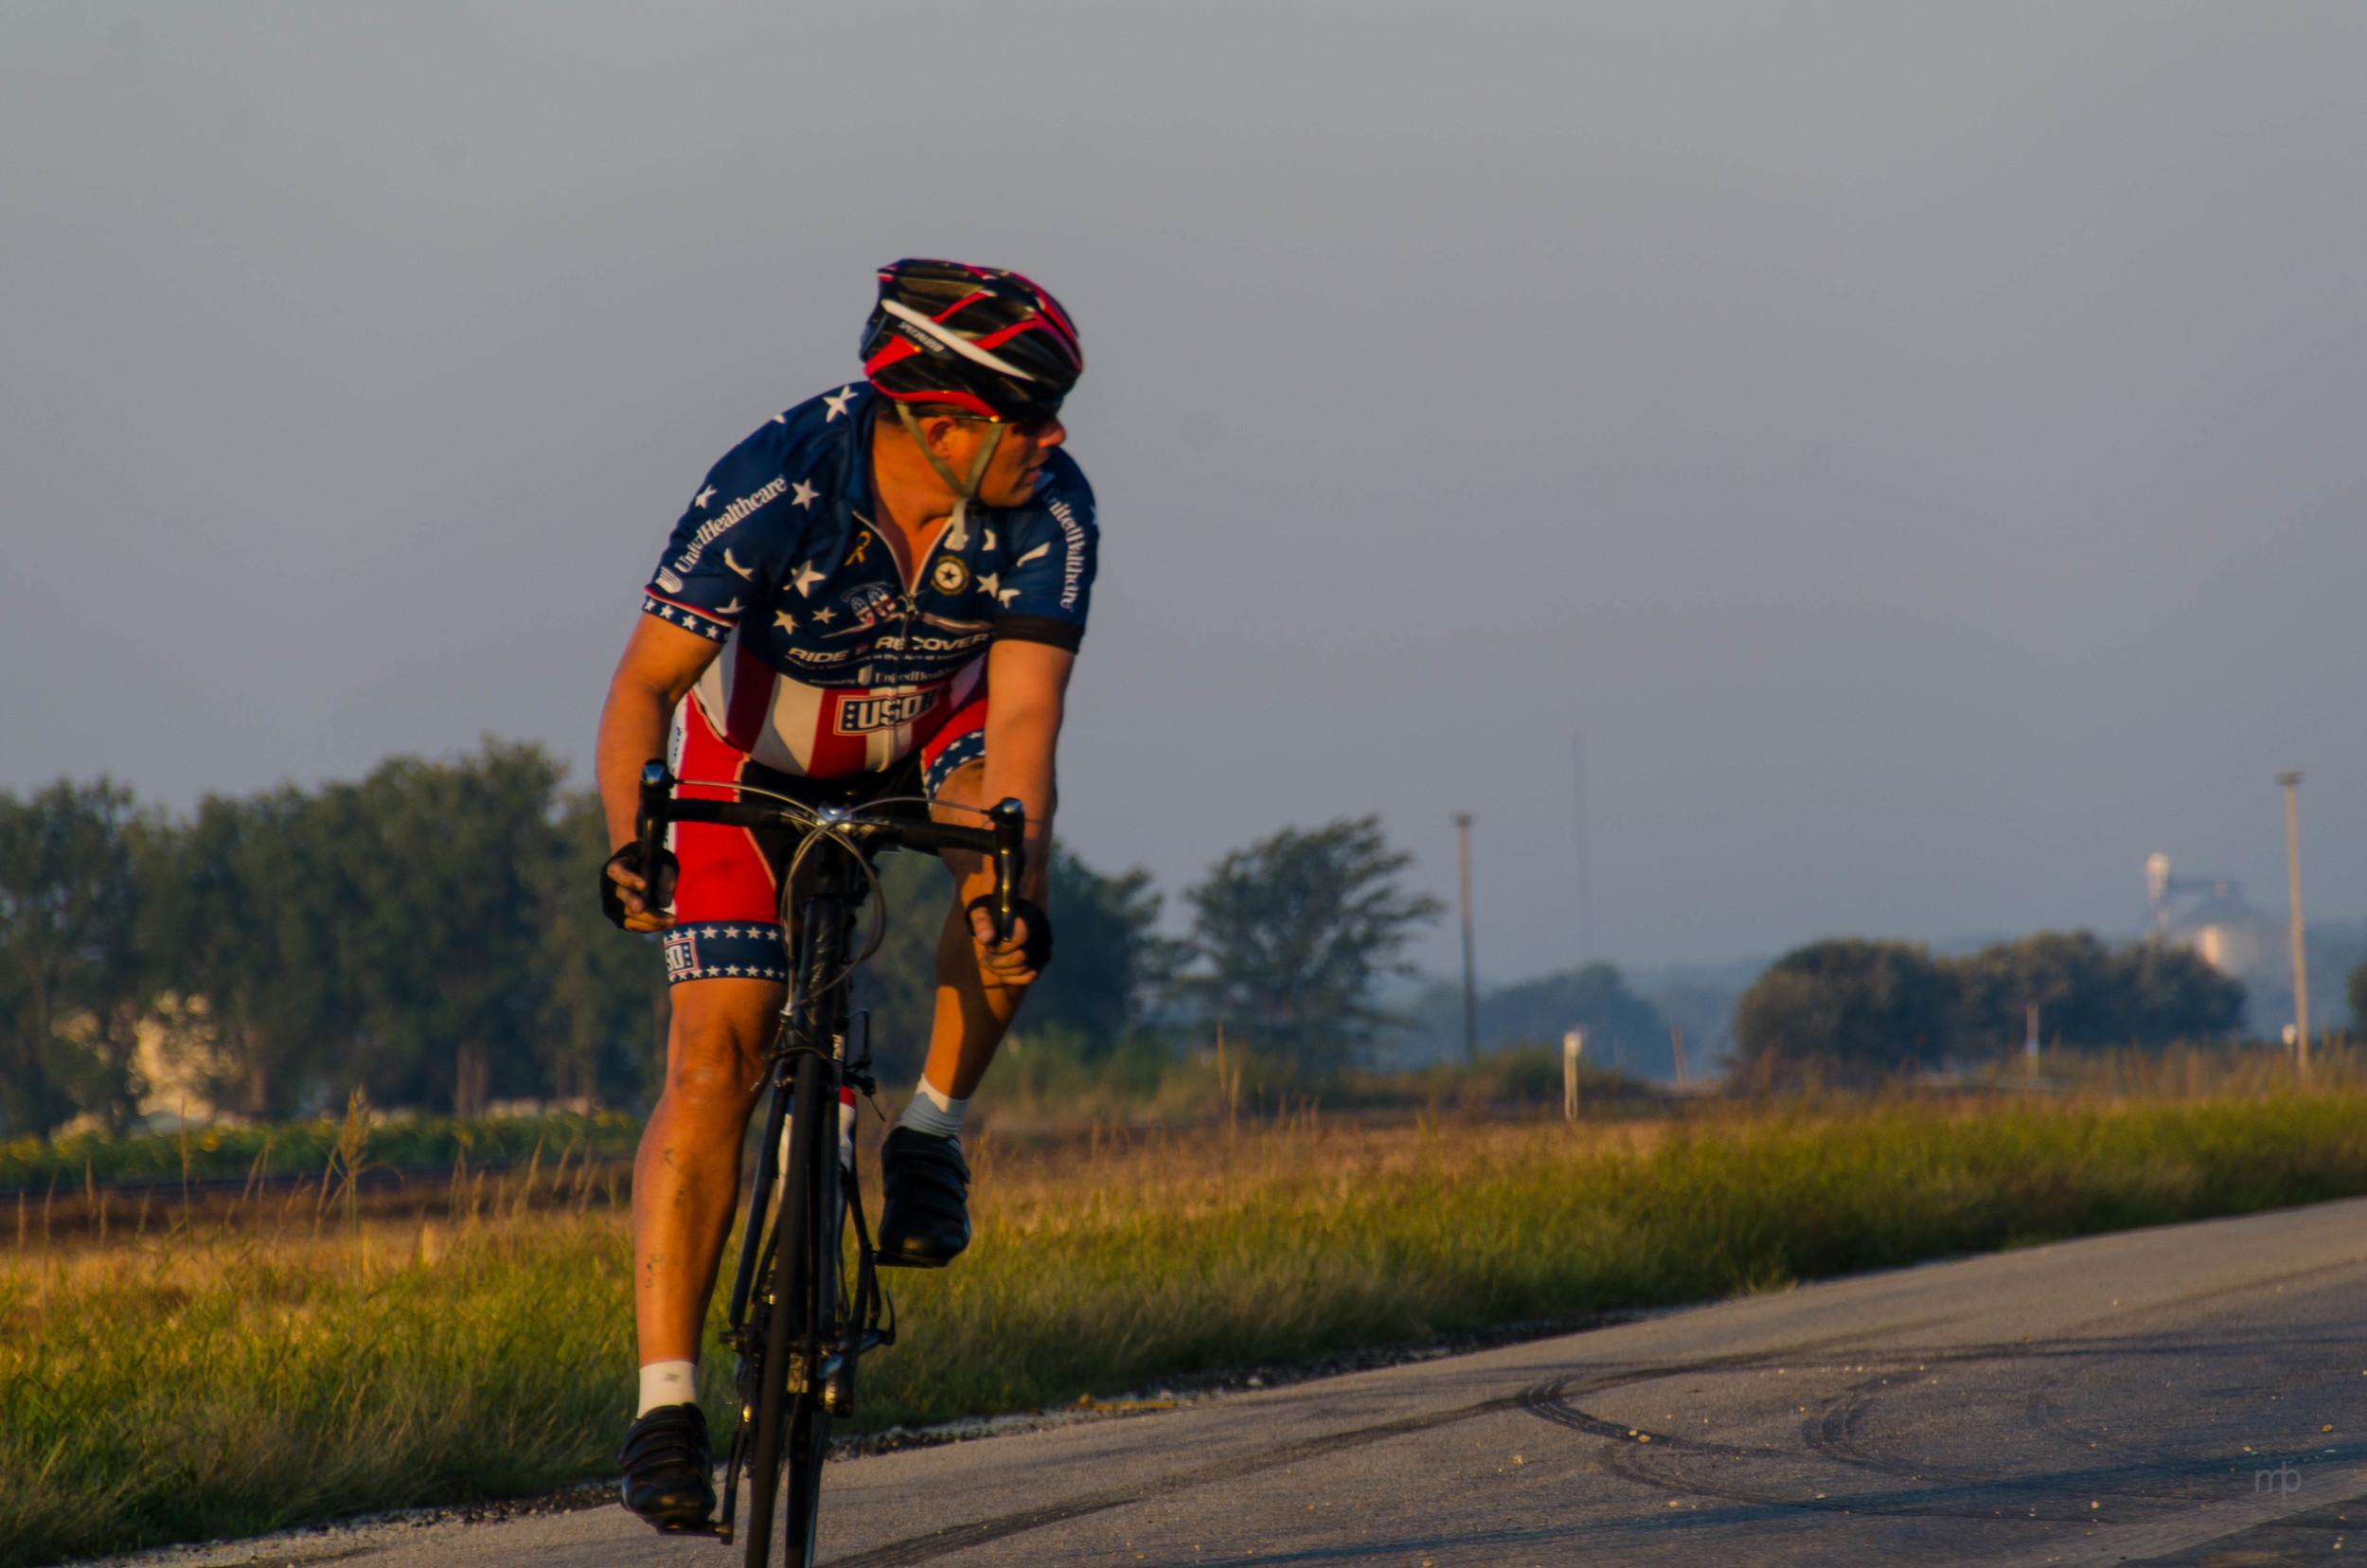 Yellow Brick Road Bike Rider. Nikon D7000, Tamron 18-270, ISO100, 200 mm f/8.0, 1/160 sec